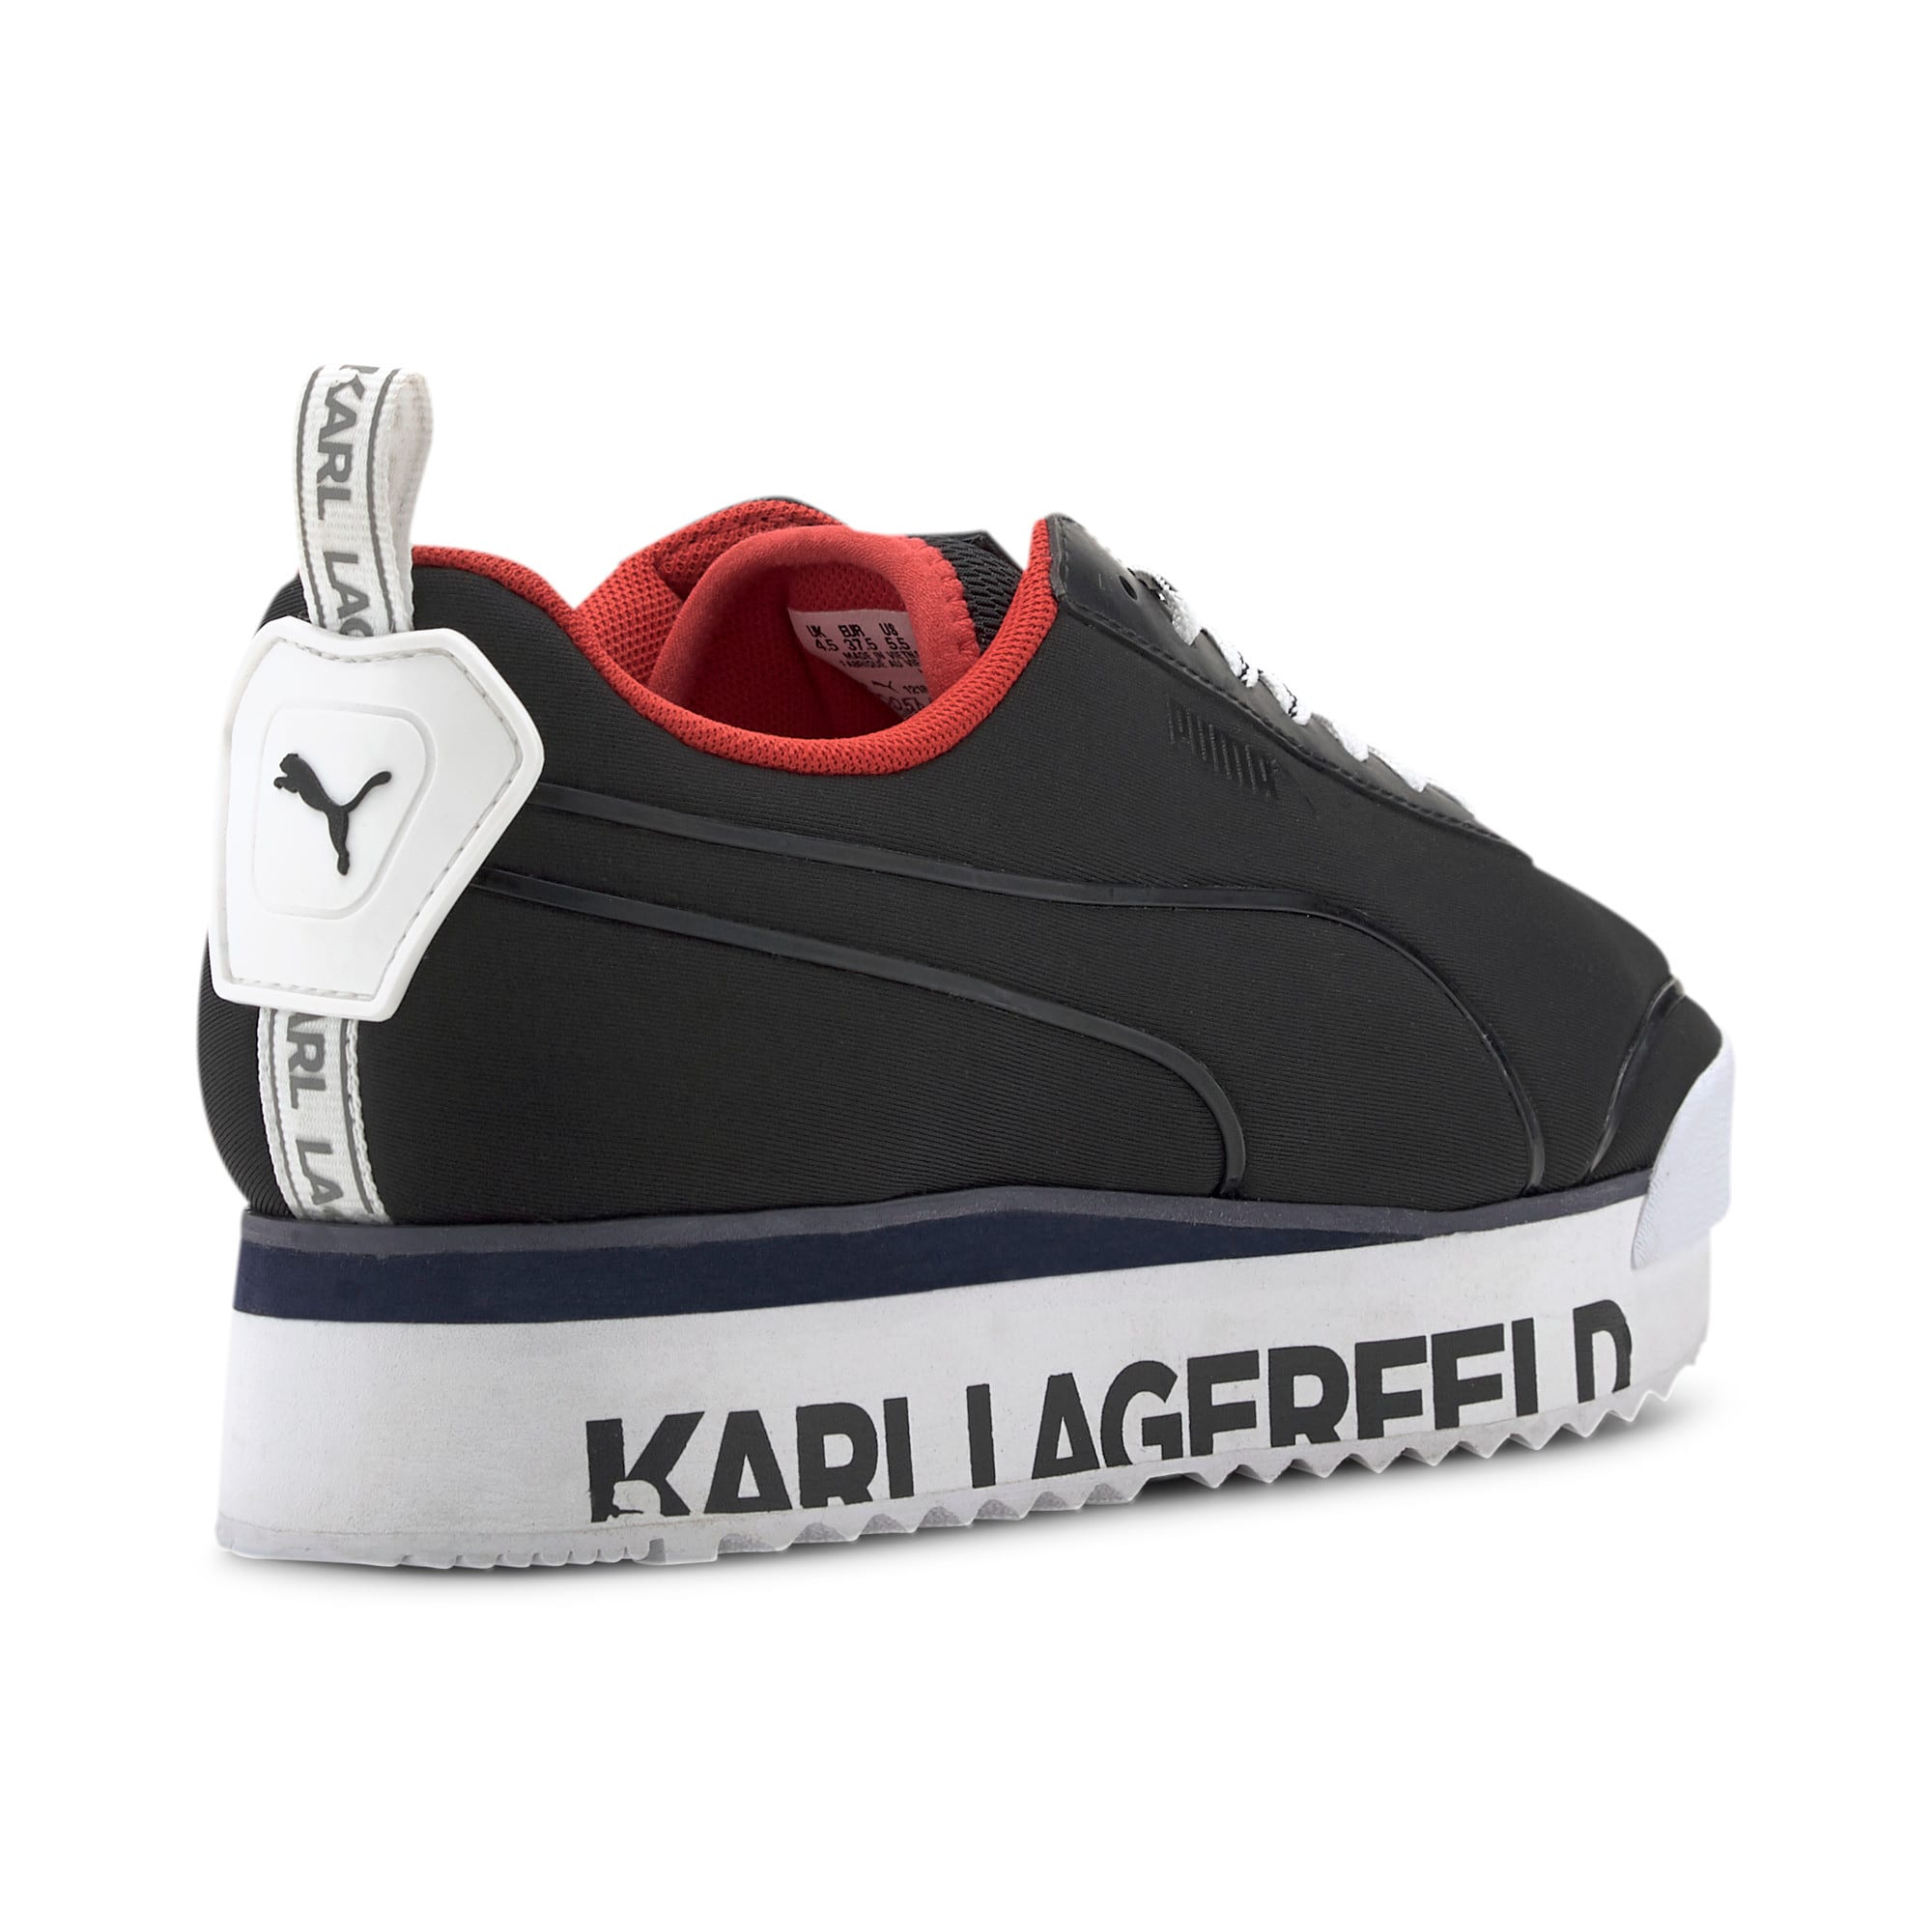 Thumbnail 9 of PUMA x KARL LAGERFELD Roma Amor Sneaker, Puma Black-Puma Black, medium